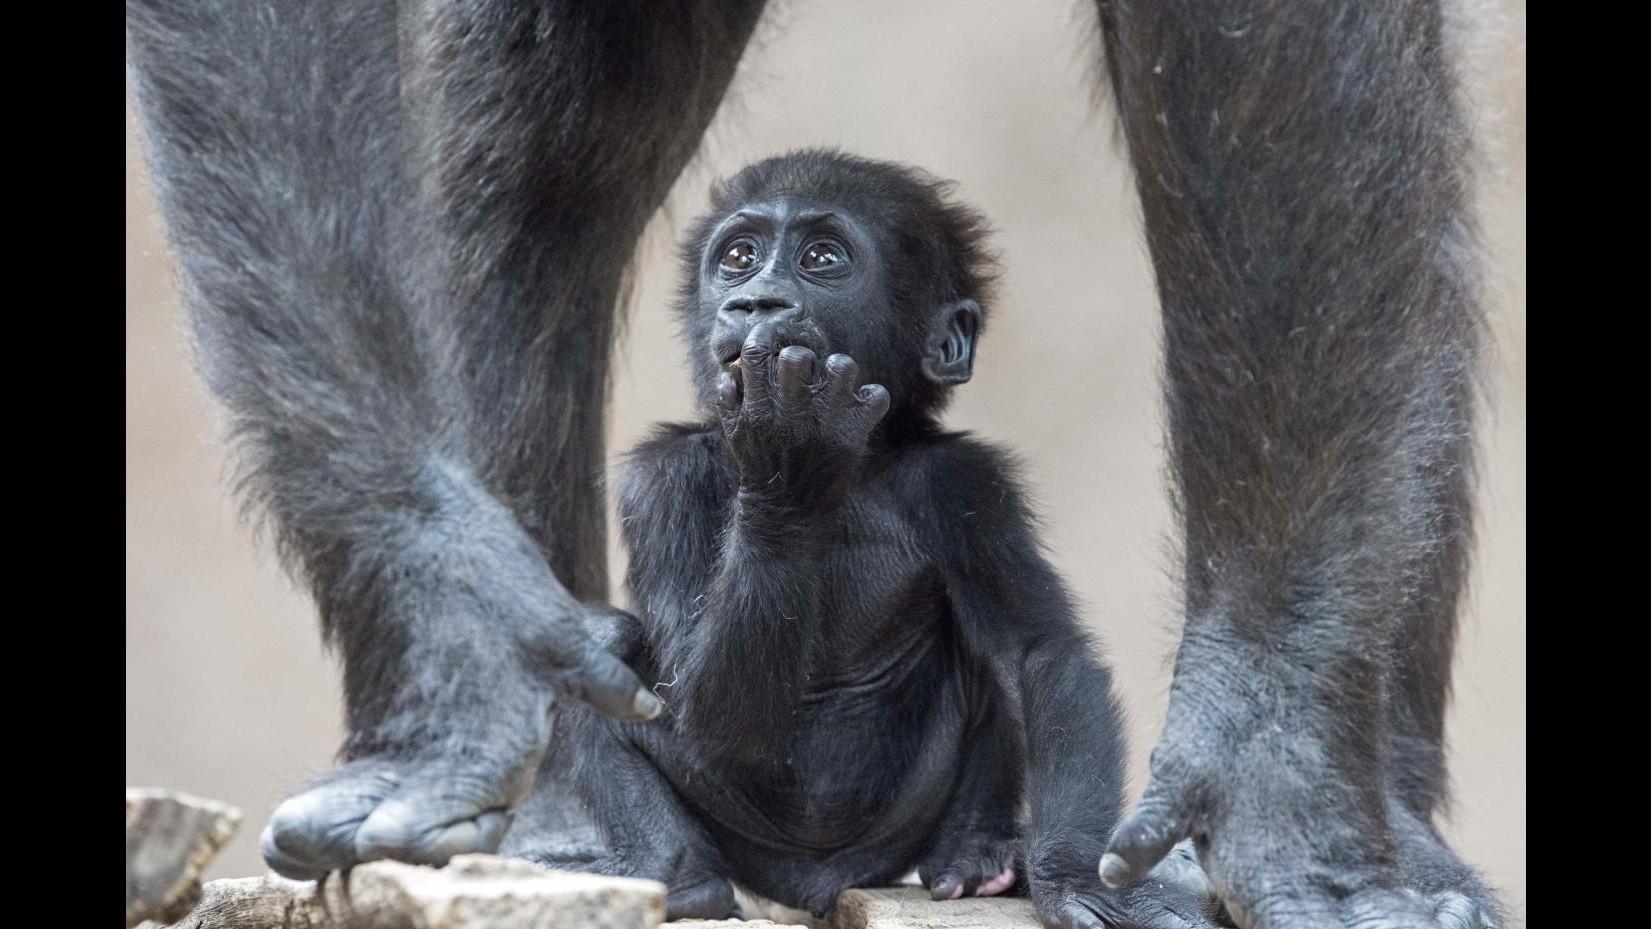 Baby gorilla nasce da parto cesareo allo zoo di San Diego